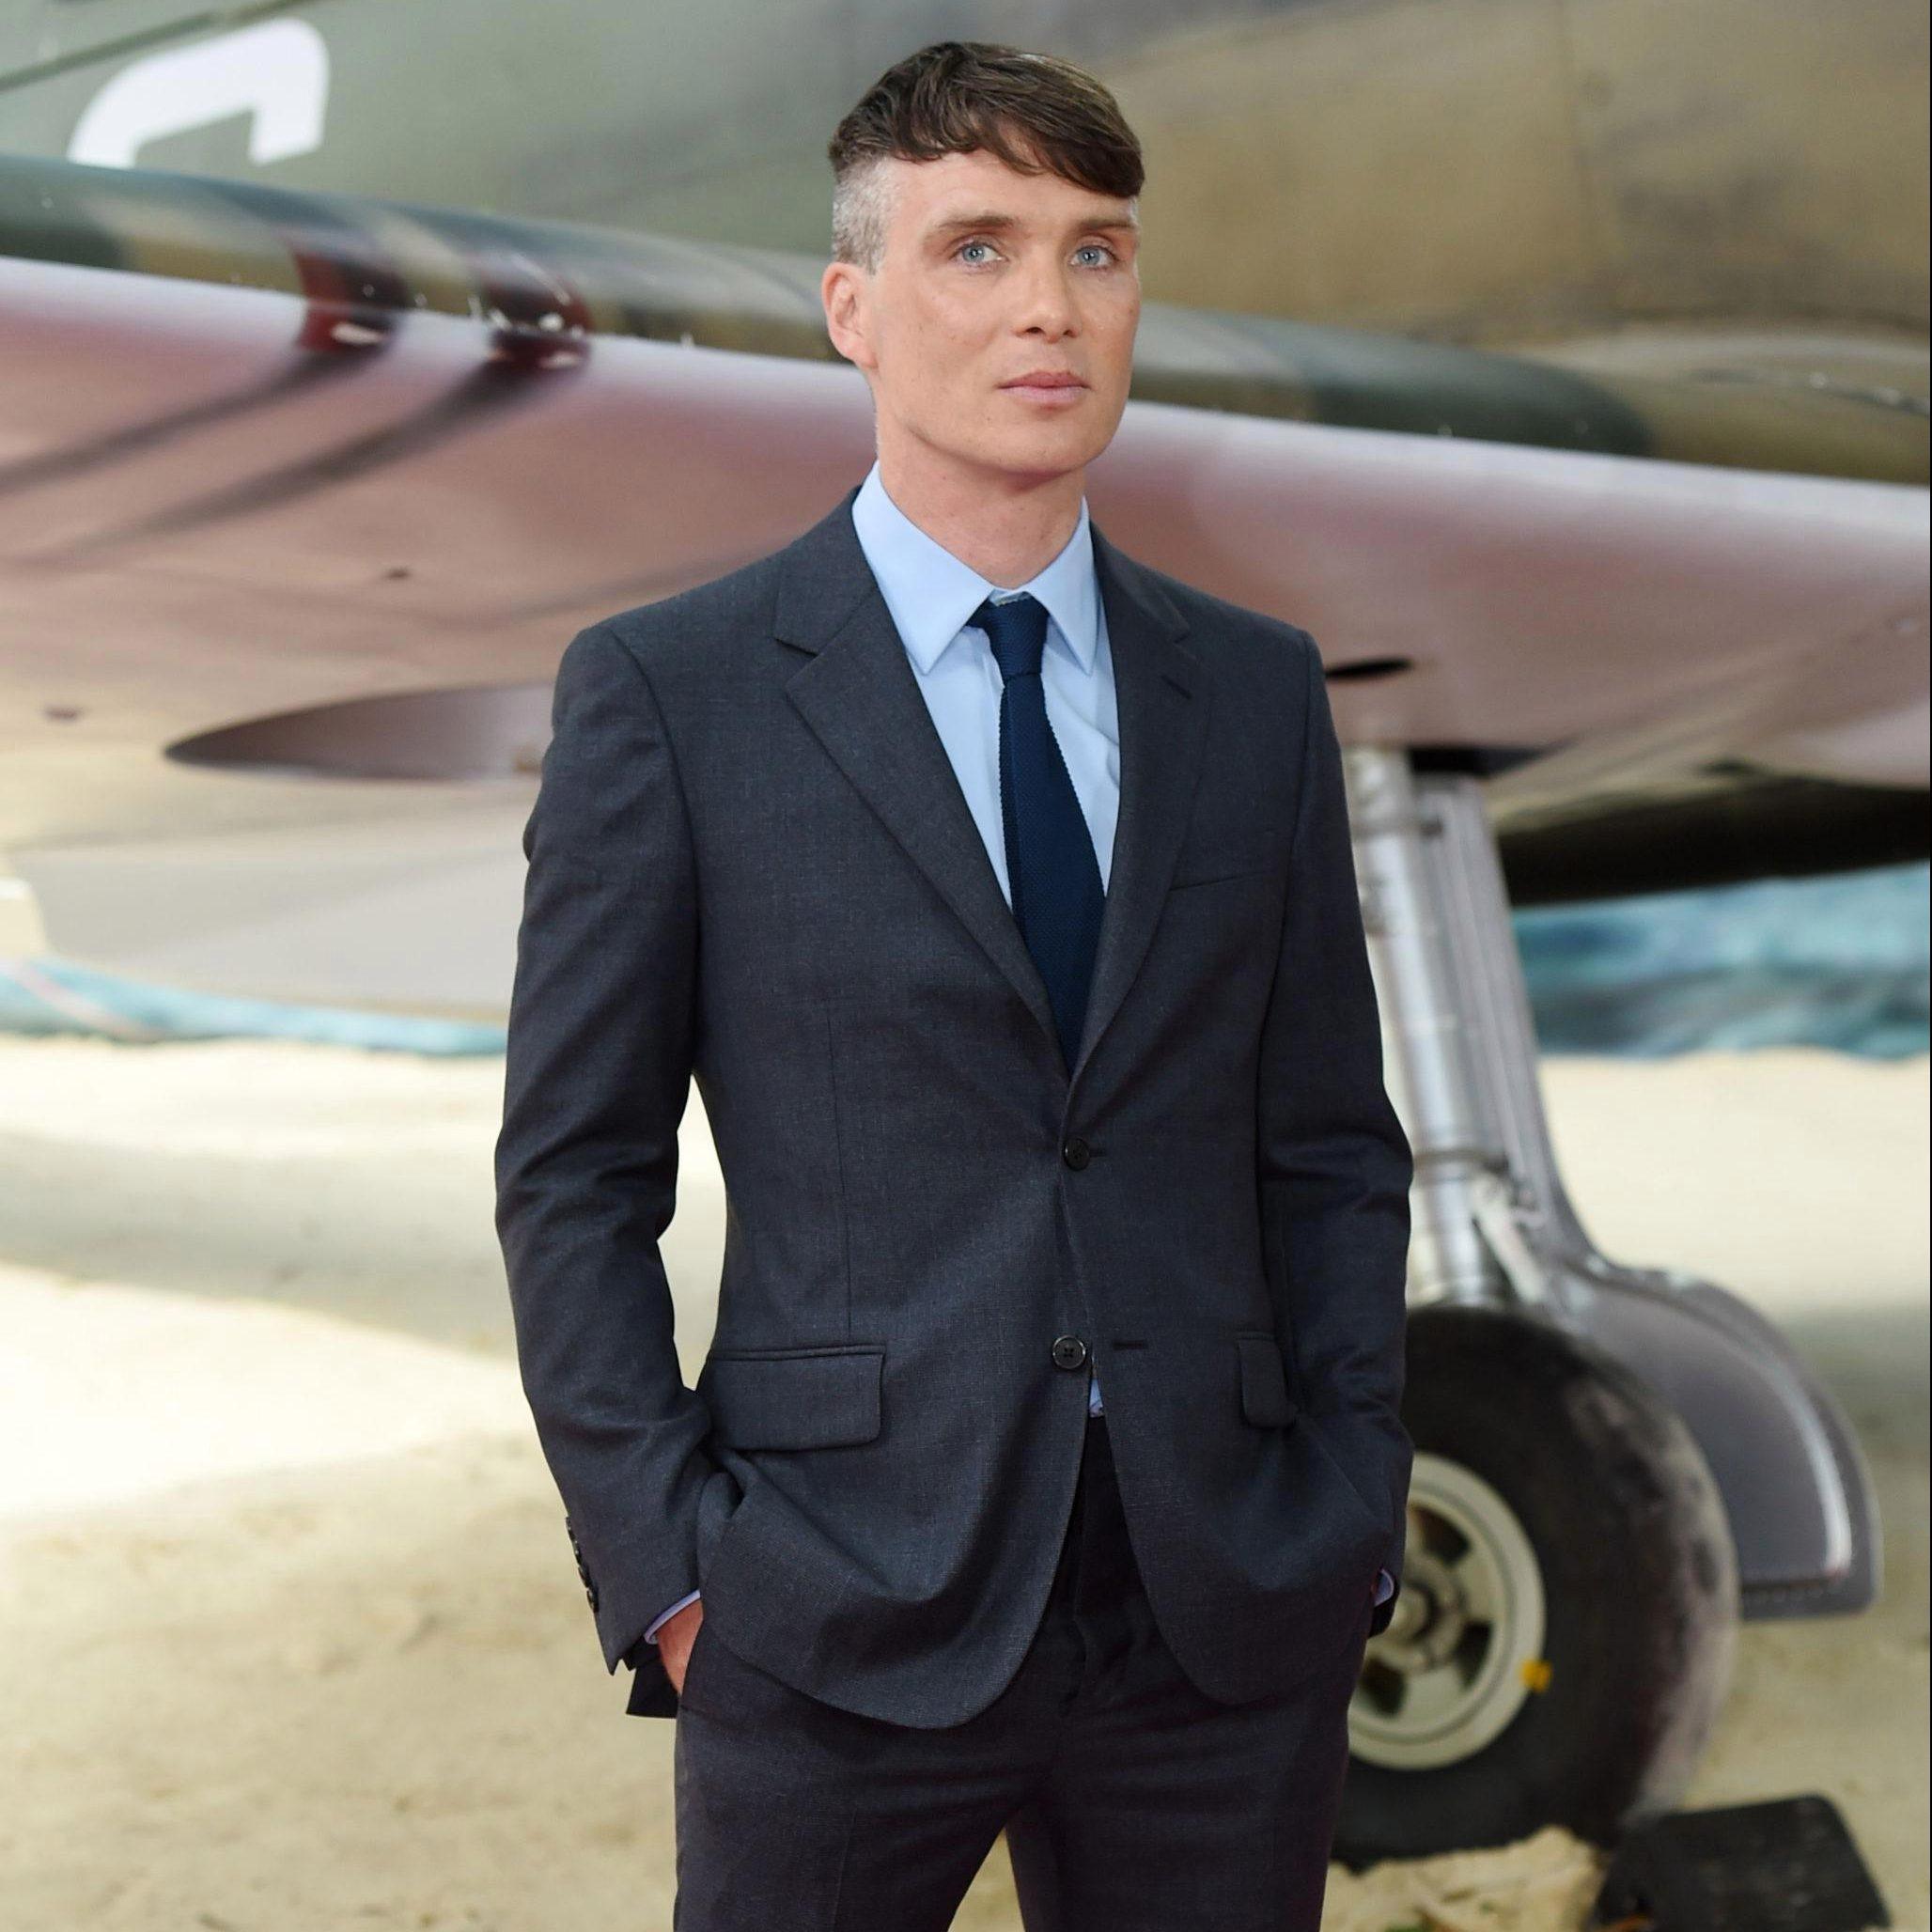 nintchdbpict000338560325 e1579090935757 20 Actors Who Would Kill It As The Next James Bond